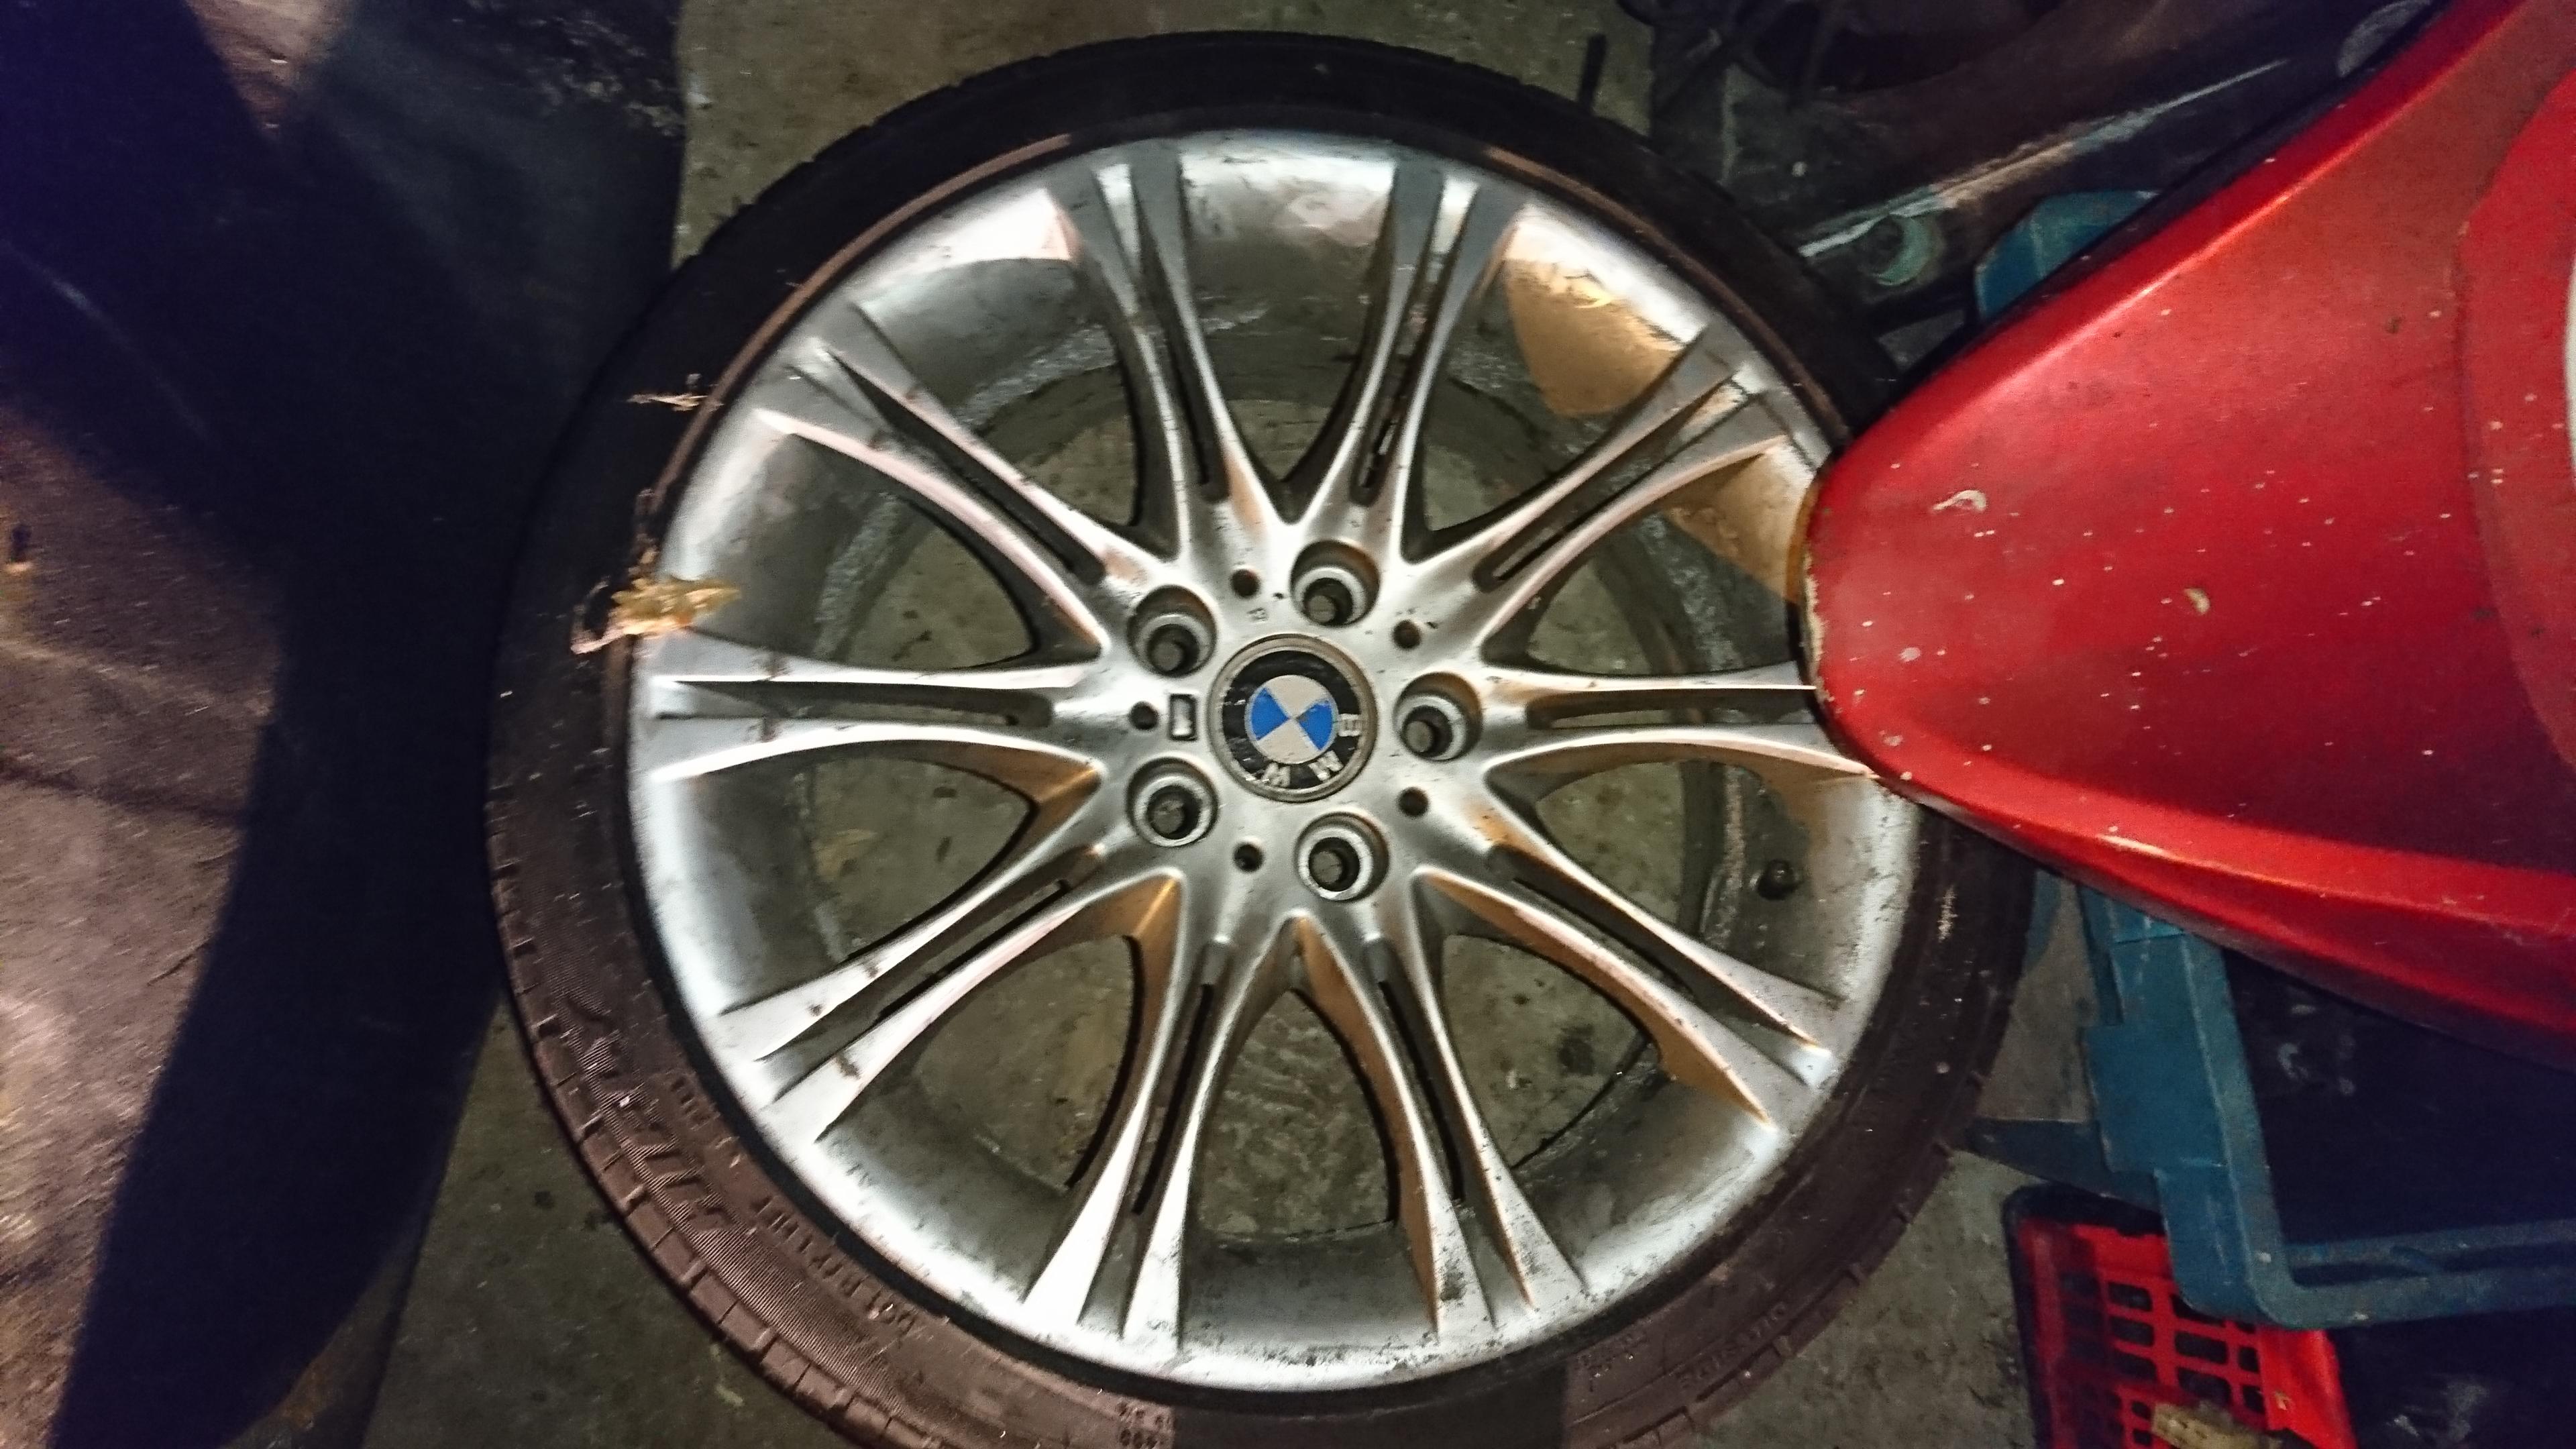 wheels australia pdw distributor for oasis passenger alloy wheel xt sale bmw s group no rims